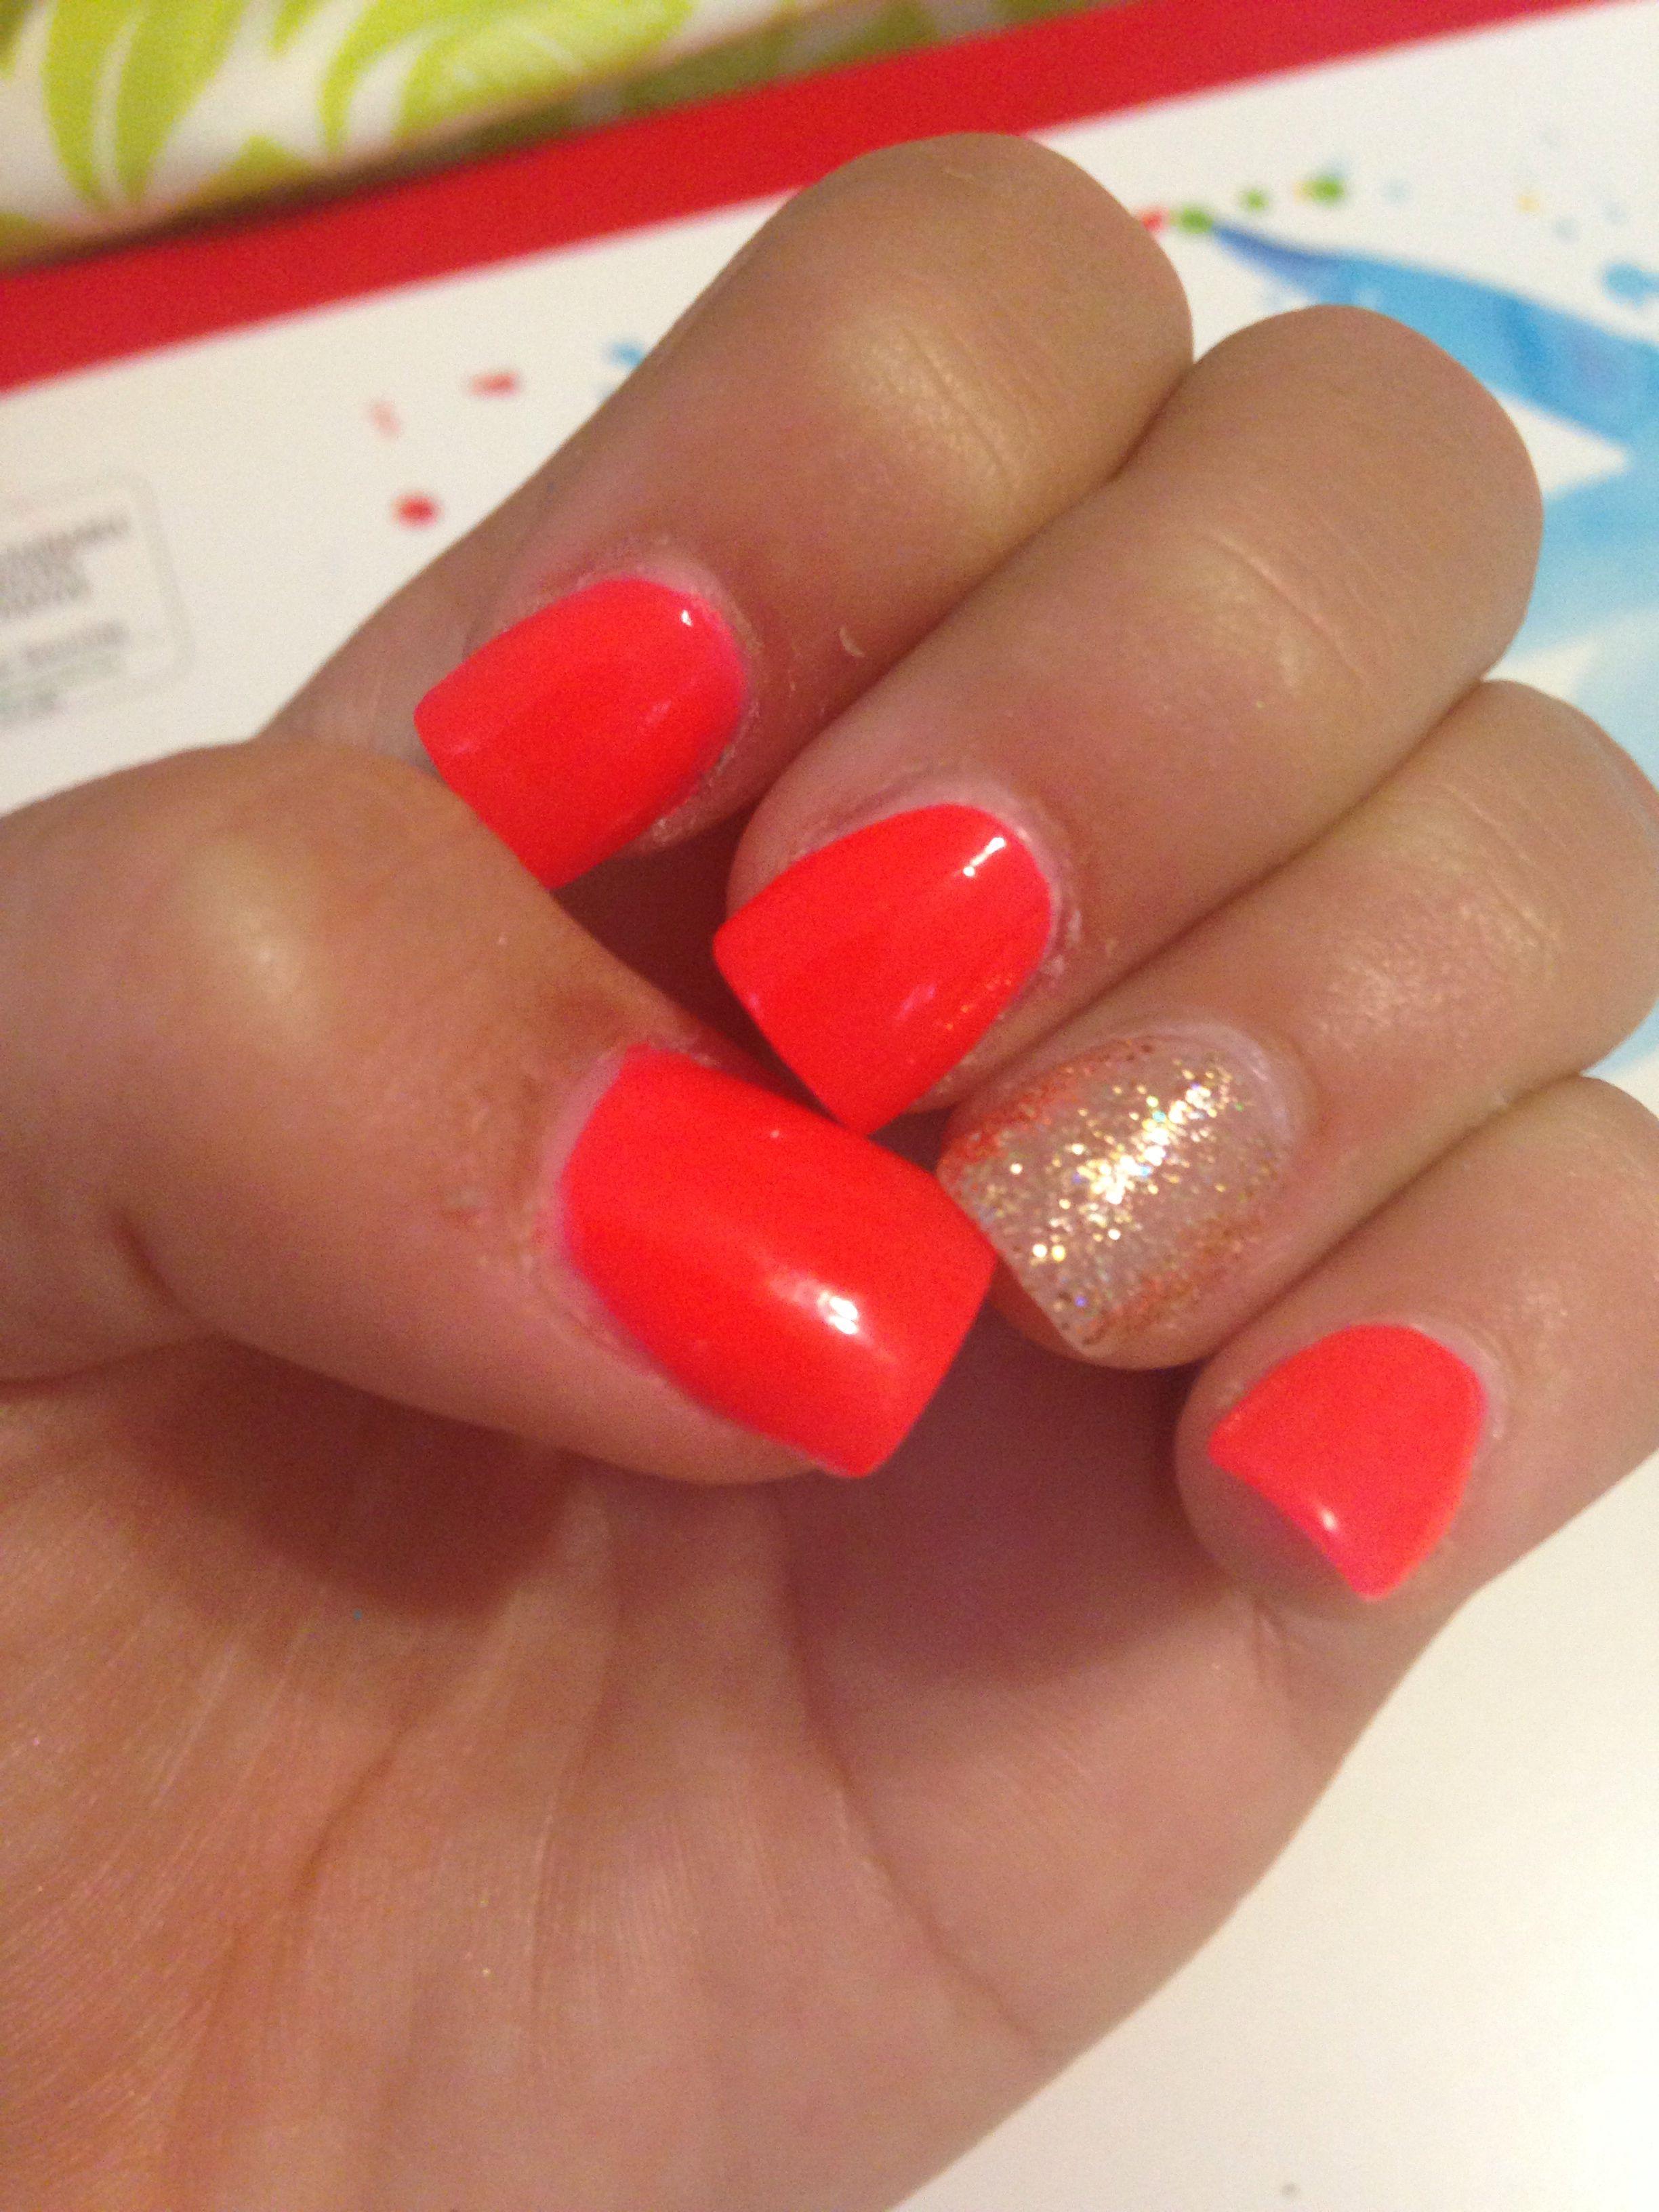 Acrylic nail idea i love this simple but summer design